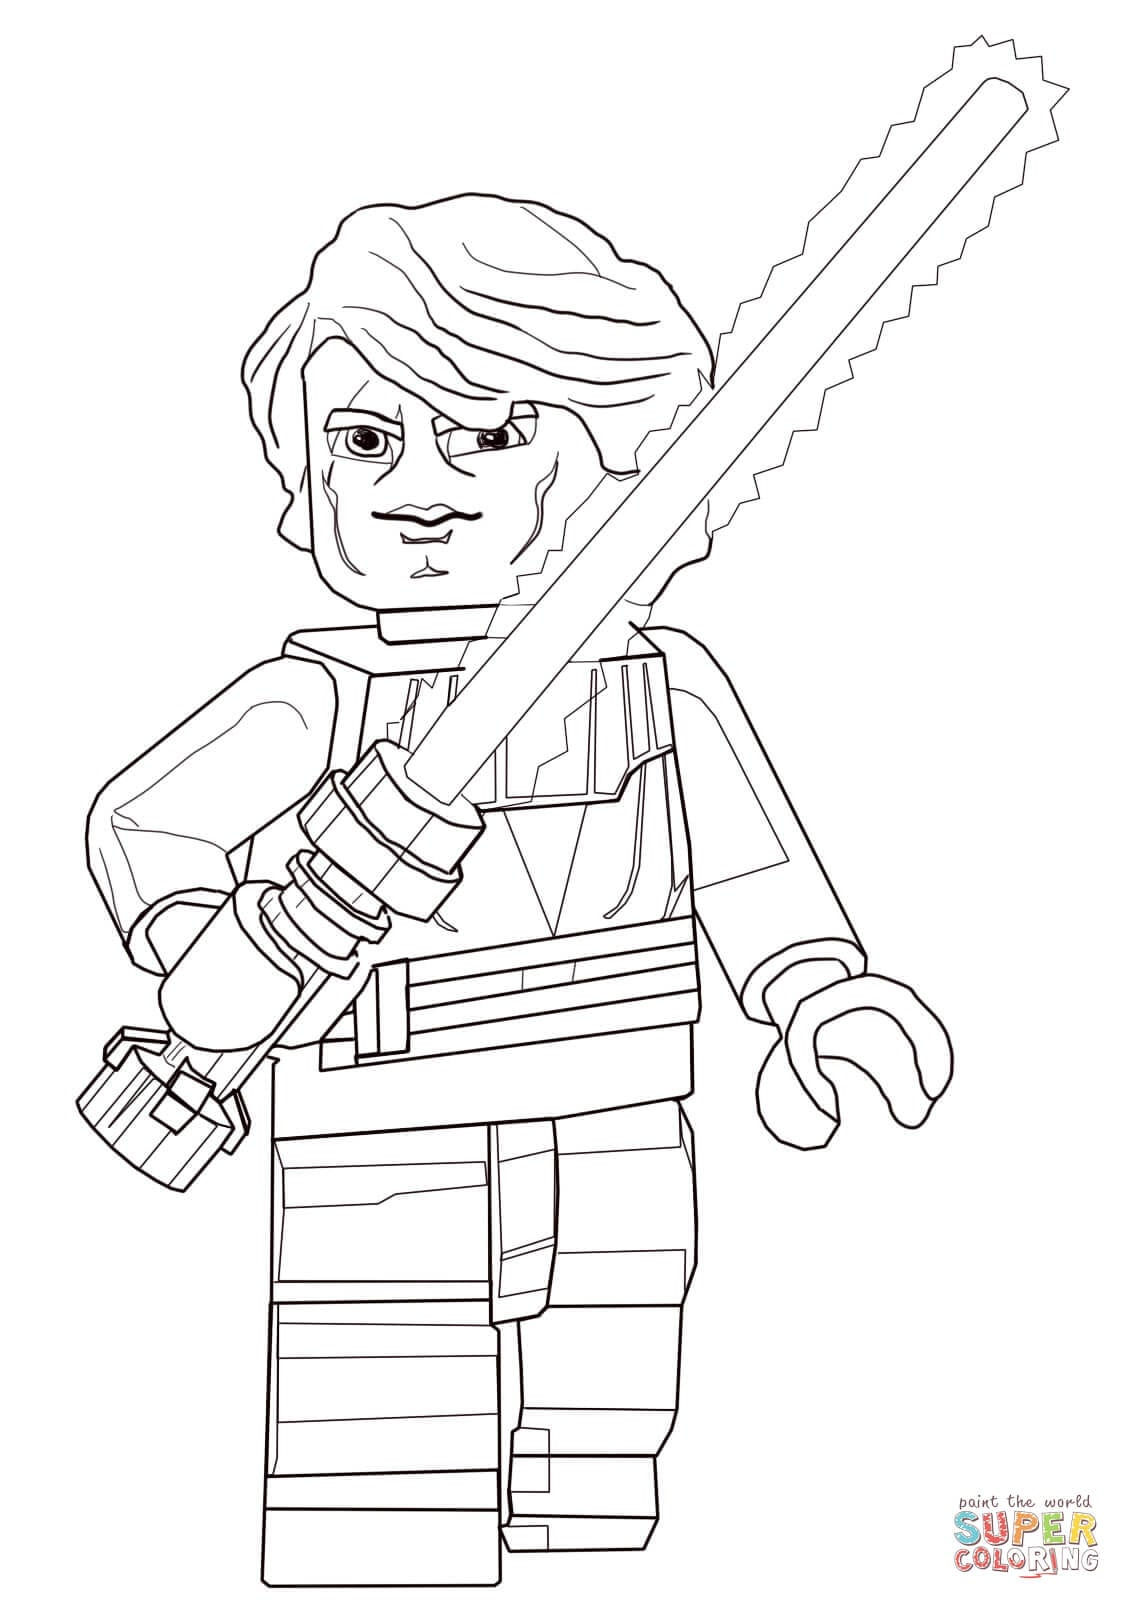 Desenho De Lego Star Wars Anakin Skywalker Para Colorir